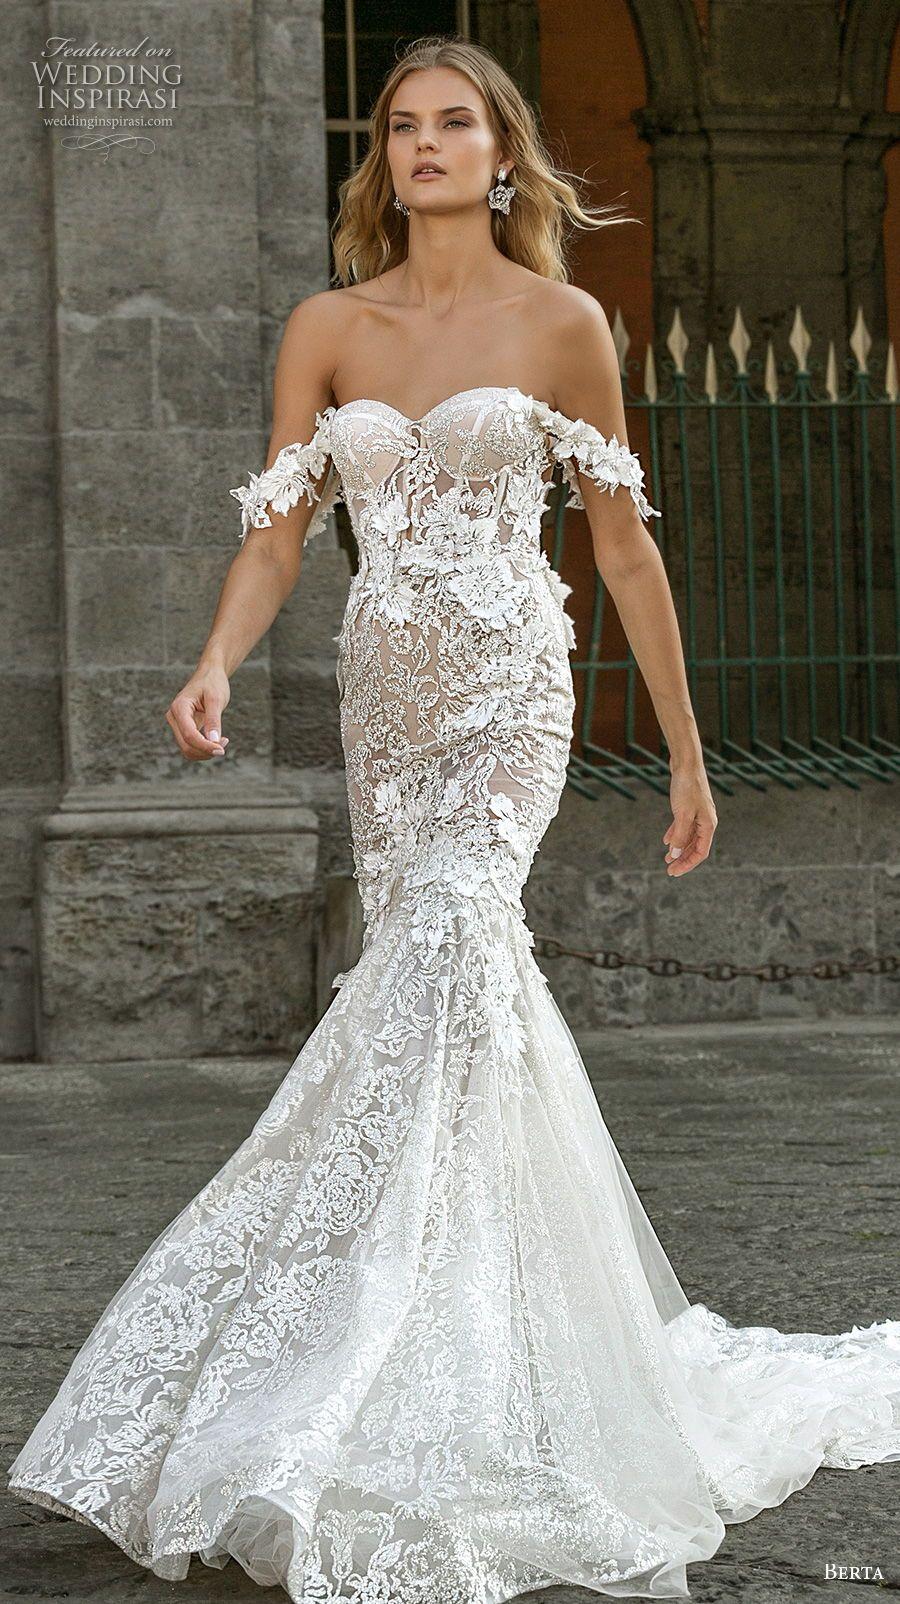 Berta Fall 2020 Wedding Dresses Napoli Bridal Collection Wedding Inspirasi Wedding Dresses Berta Wedding Dress Mermaid Wedding Dress [ 1604 x 900 Pixel ]